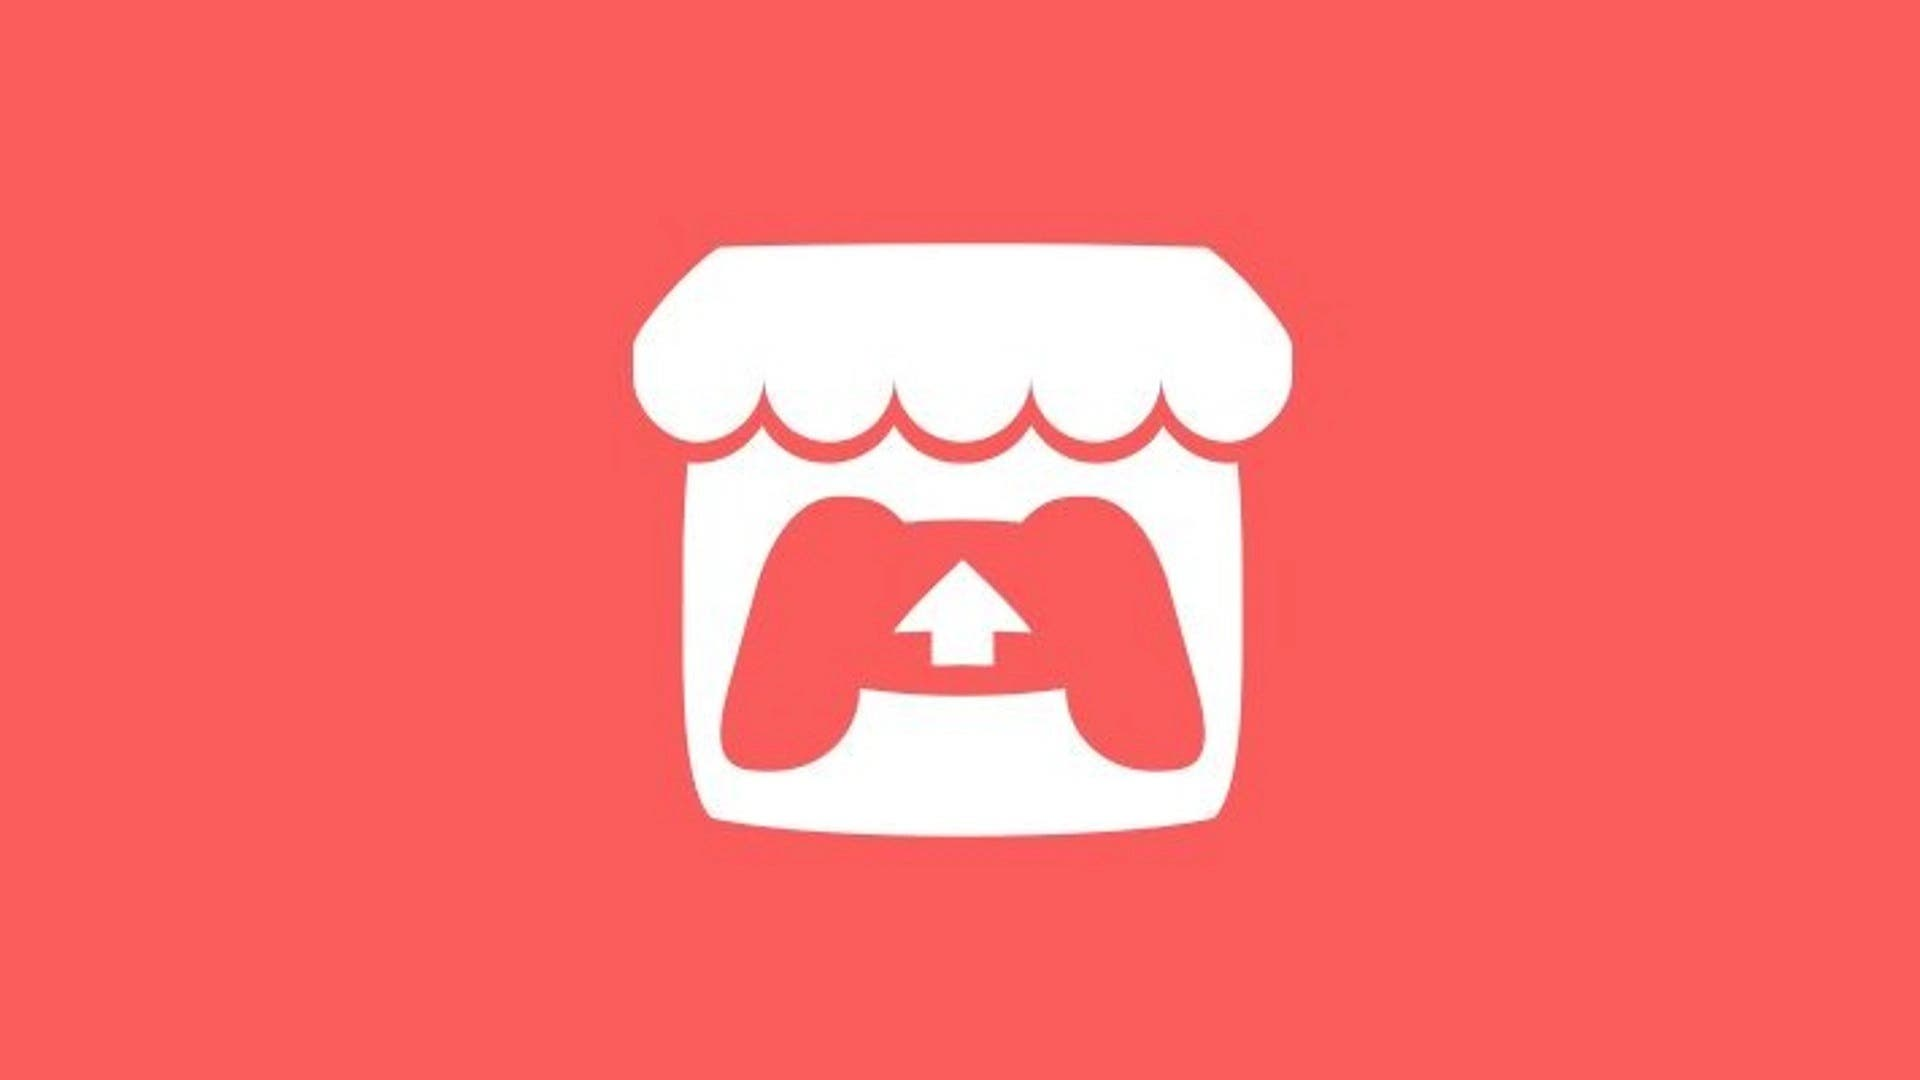 La tienda indie itch.io se une a la Epic Games Store 3